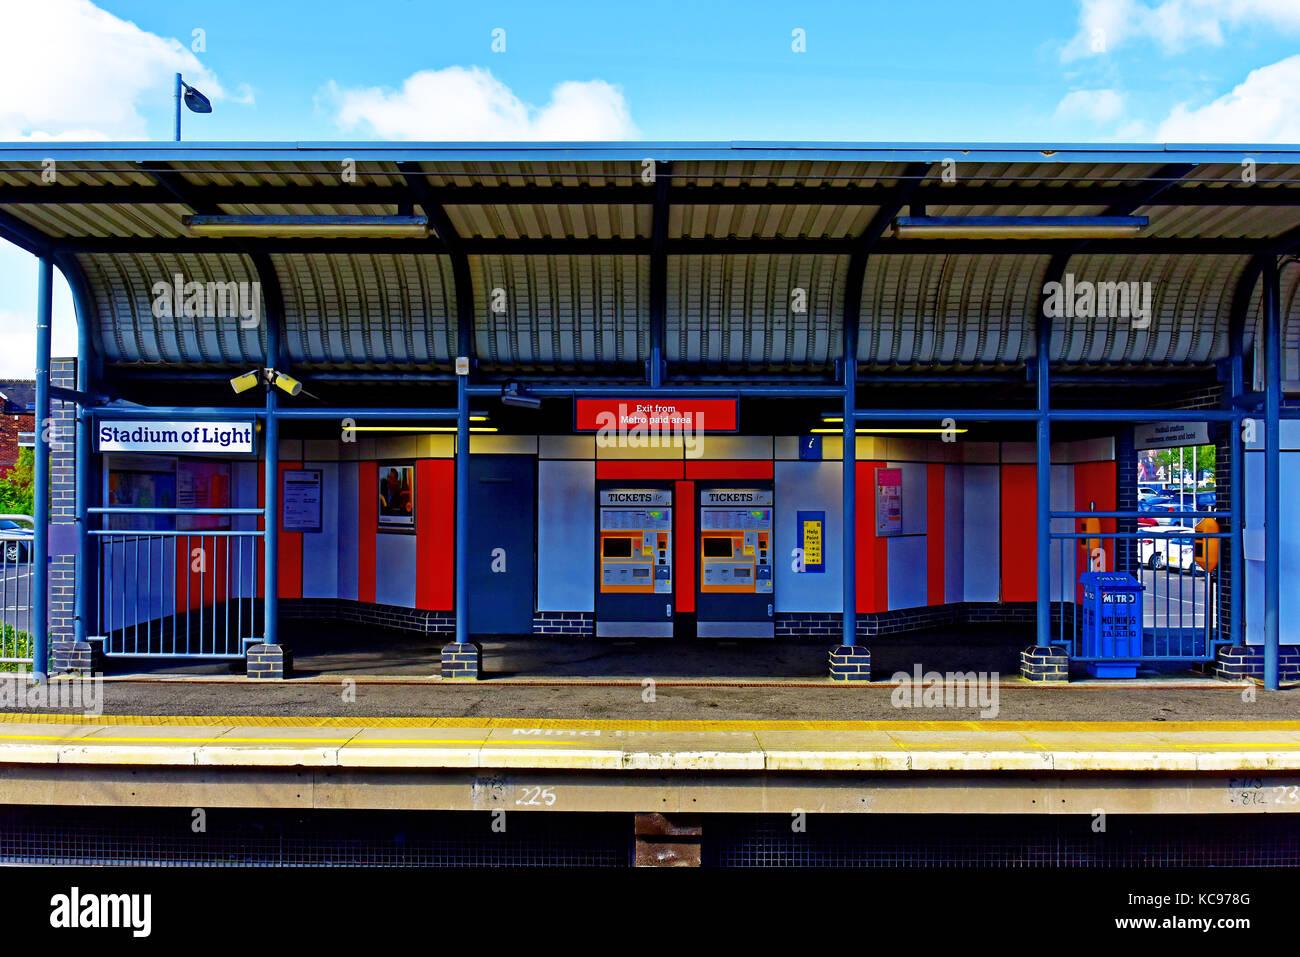 Sunderland Stadium of Light Tyne and Wear Red and White Metro station Stock Photo